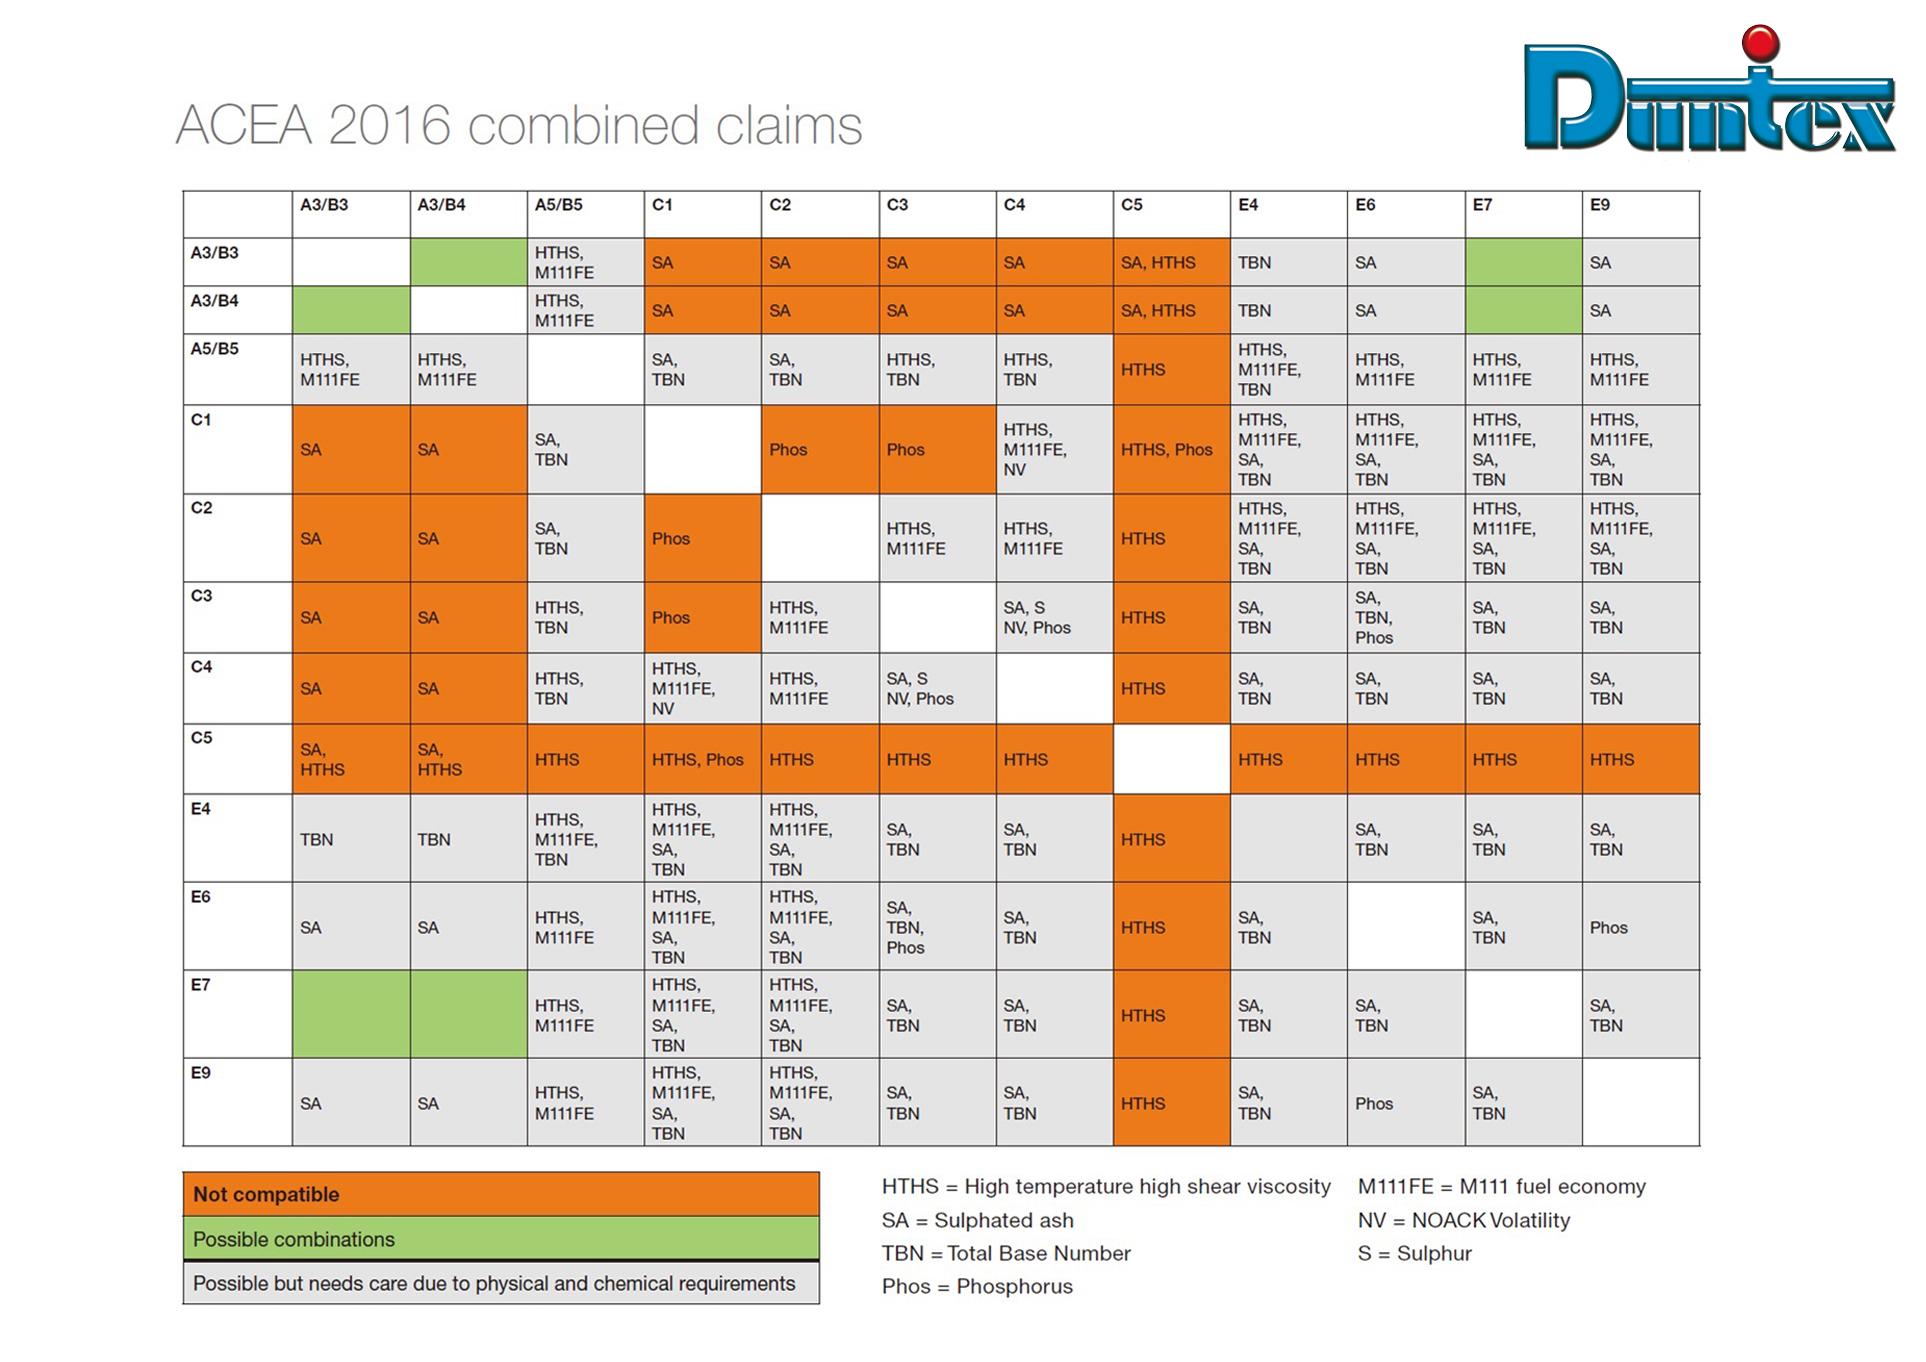 DUNTEX-ACEA 2016對照表.jpg